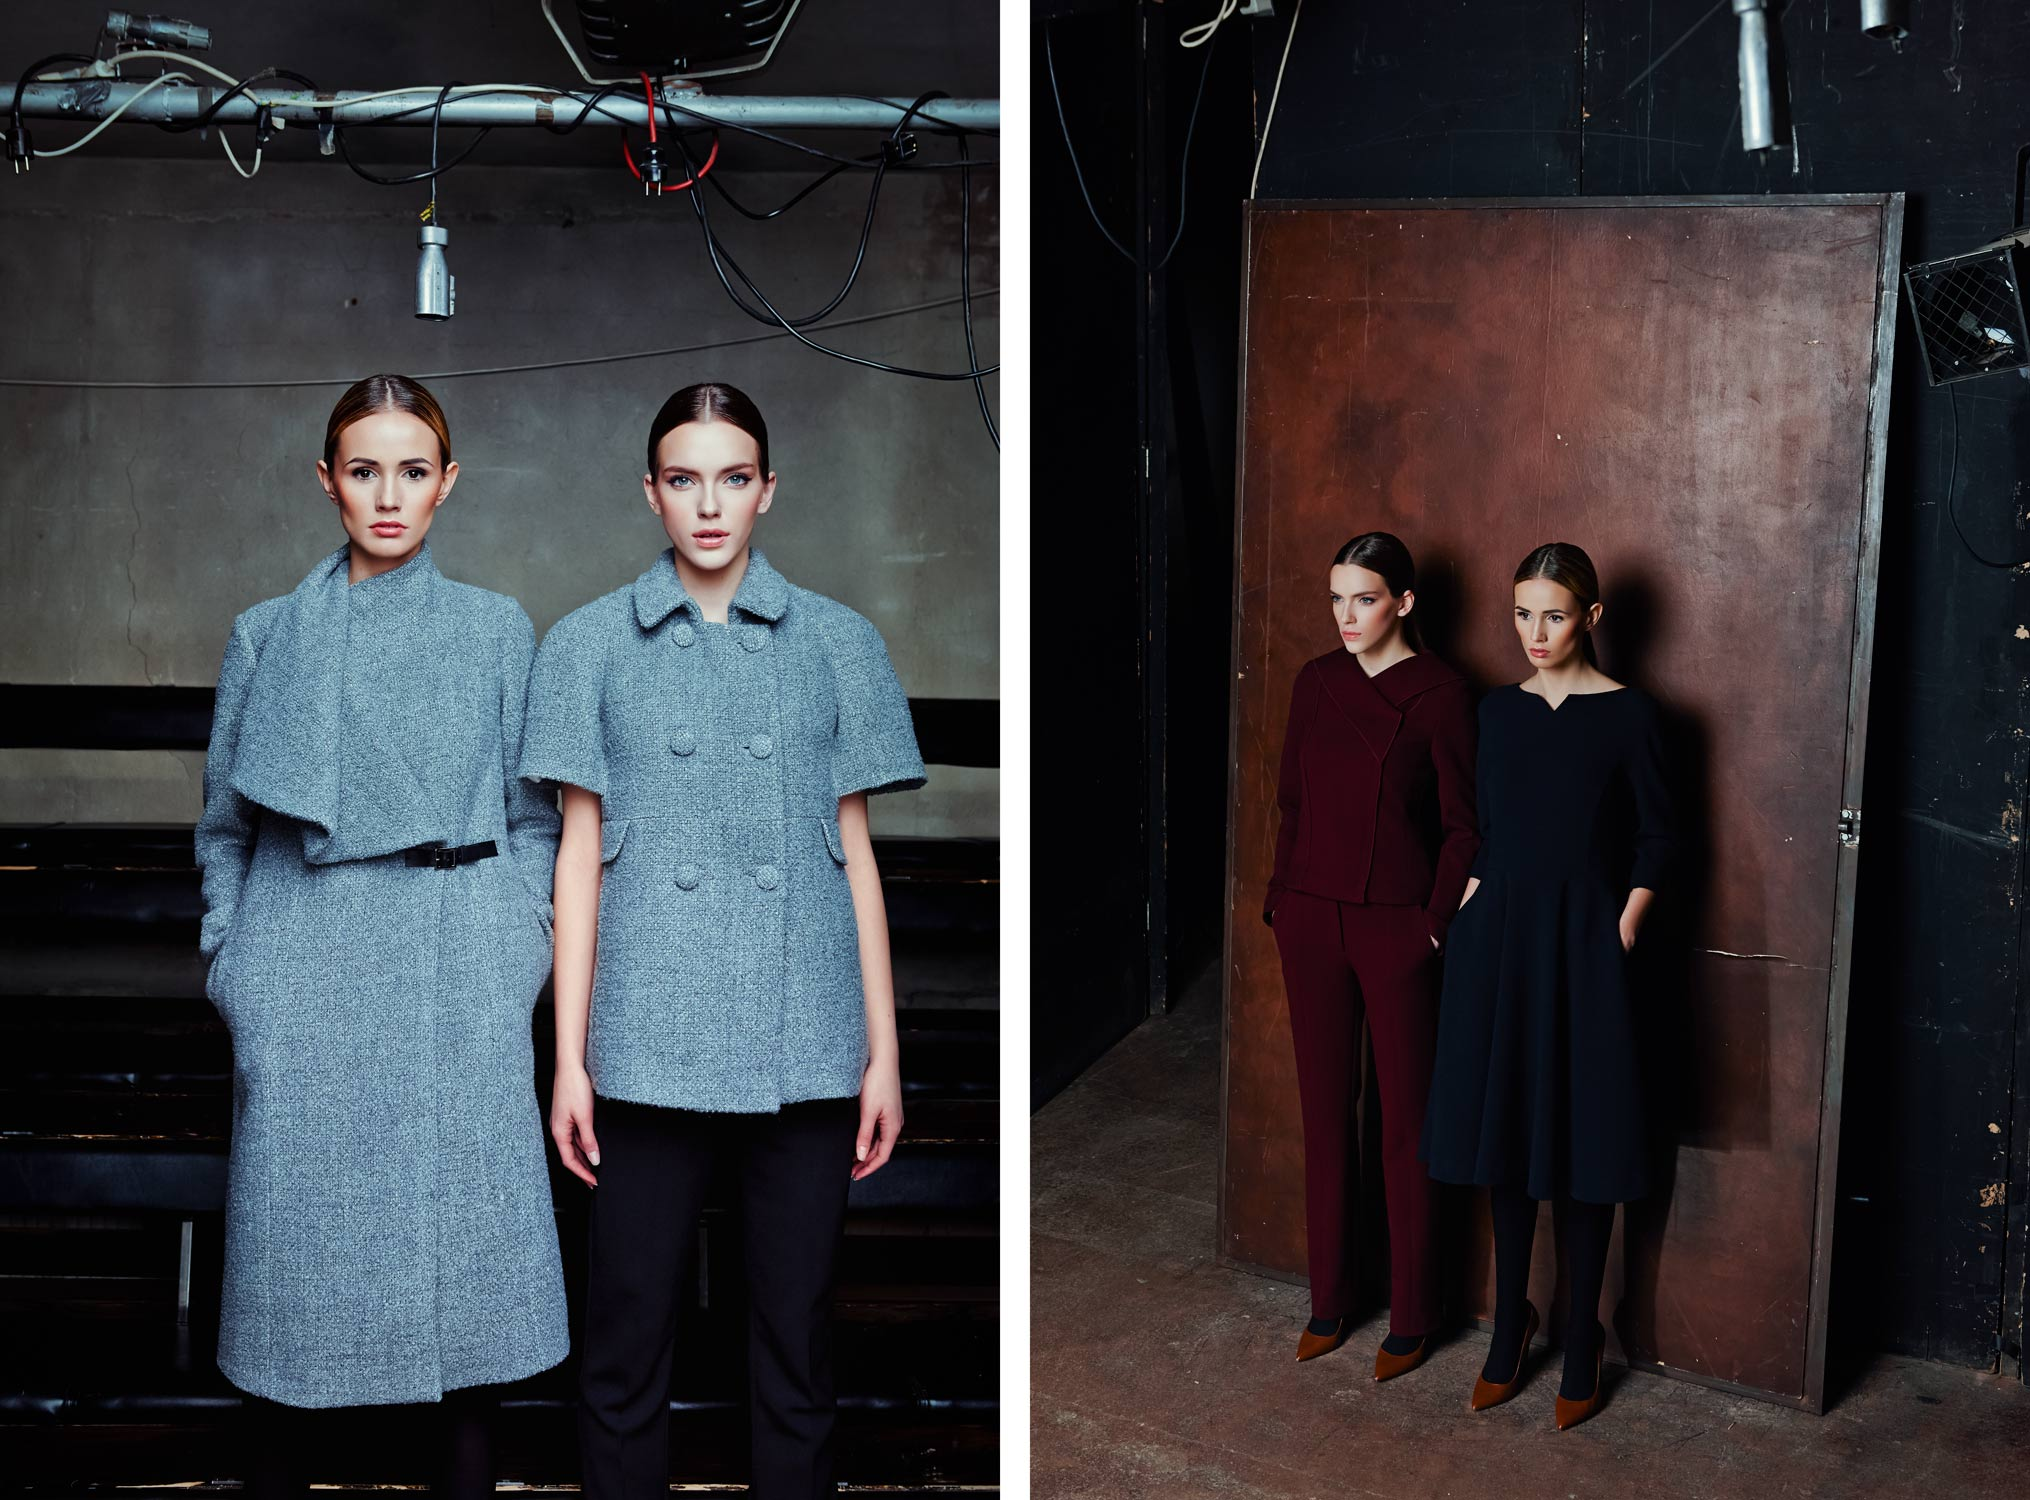 <p>LOULU ET TU<br /> Winter campaign<br /> Laura Jaraminaitė<br /> Eglė Ungurytė<br /> Lithuania<br /> 2014</p>